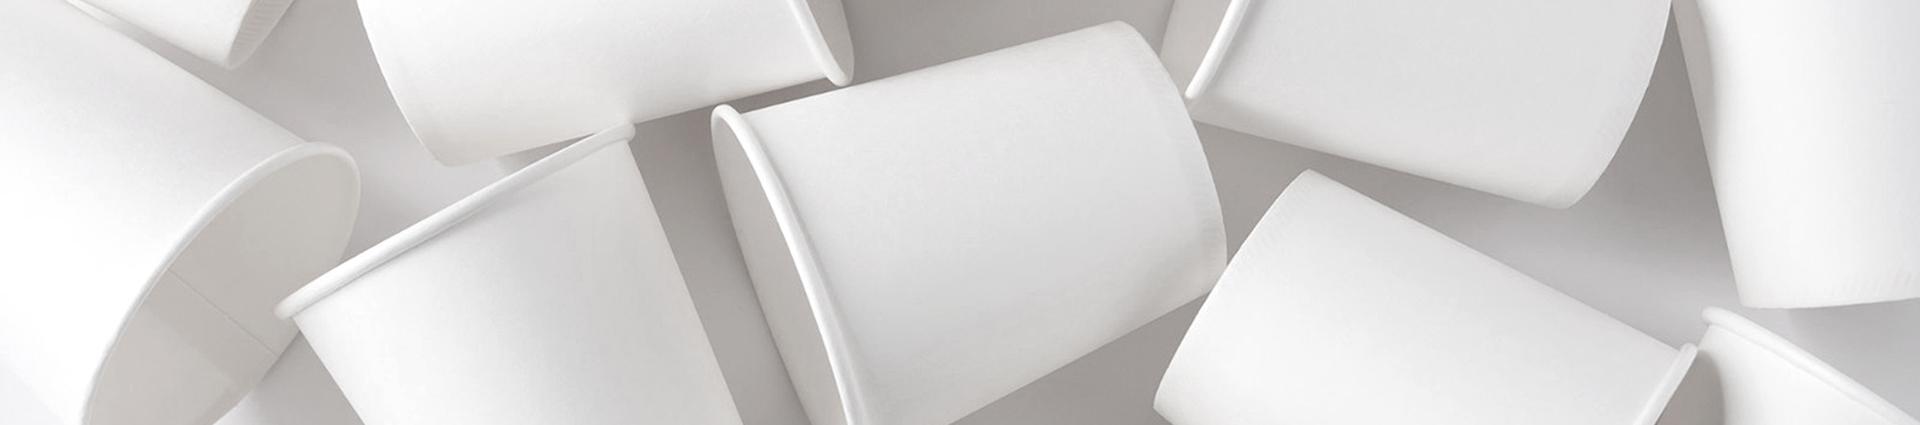 Paper/Cardboard